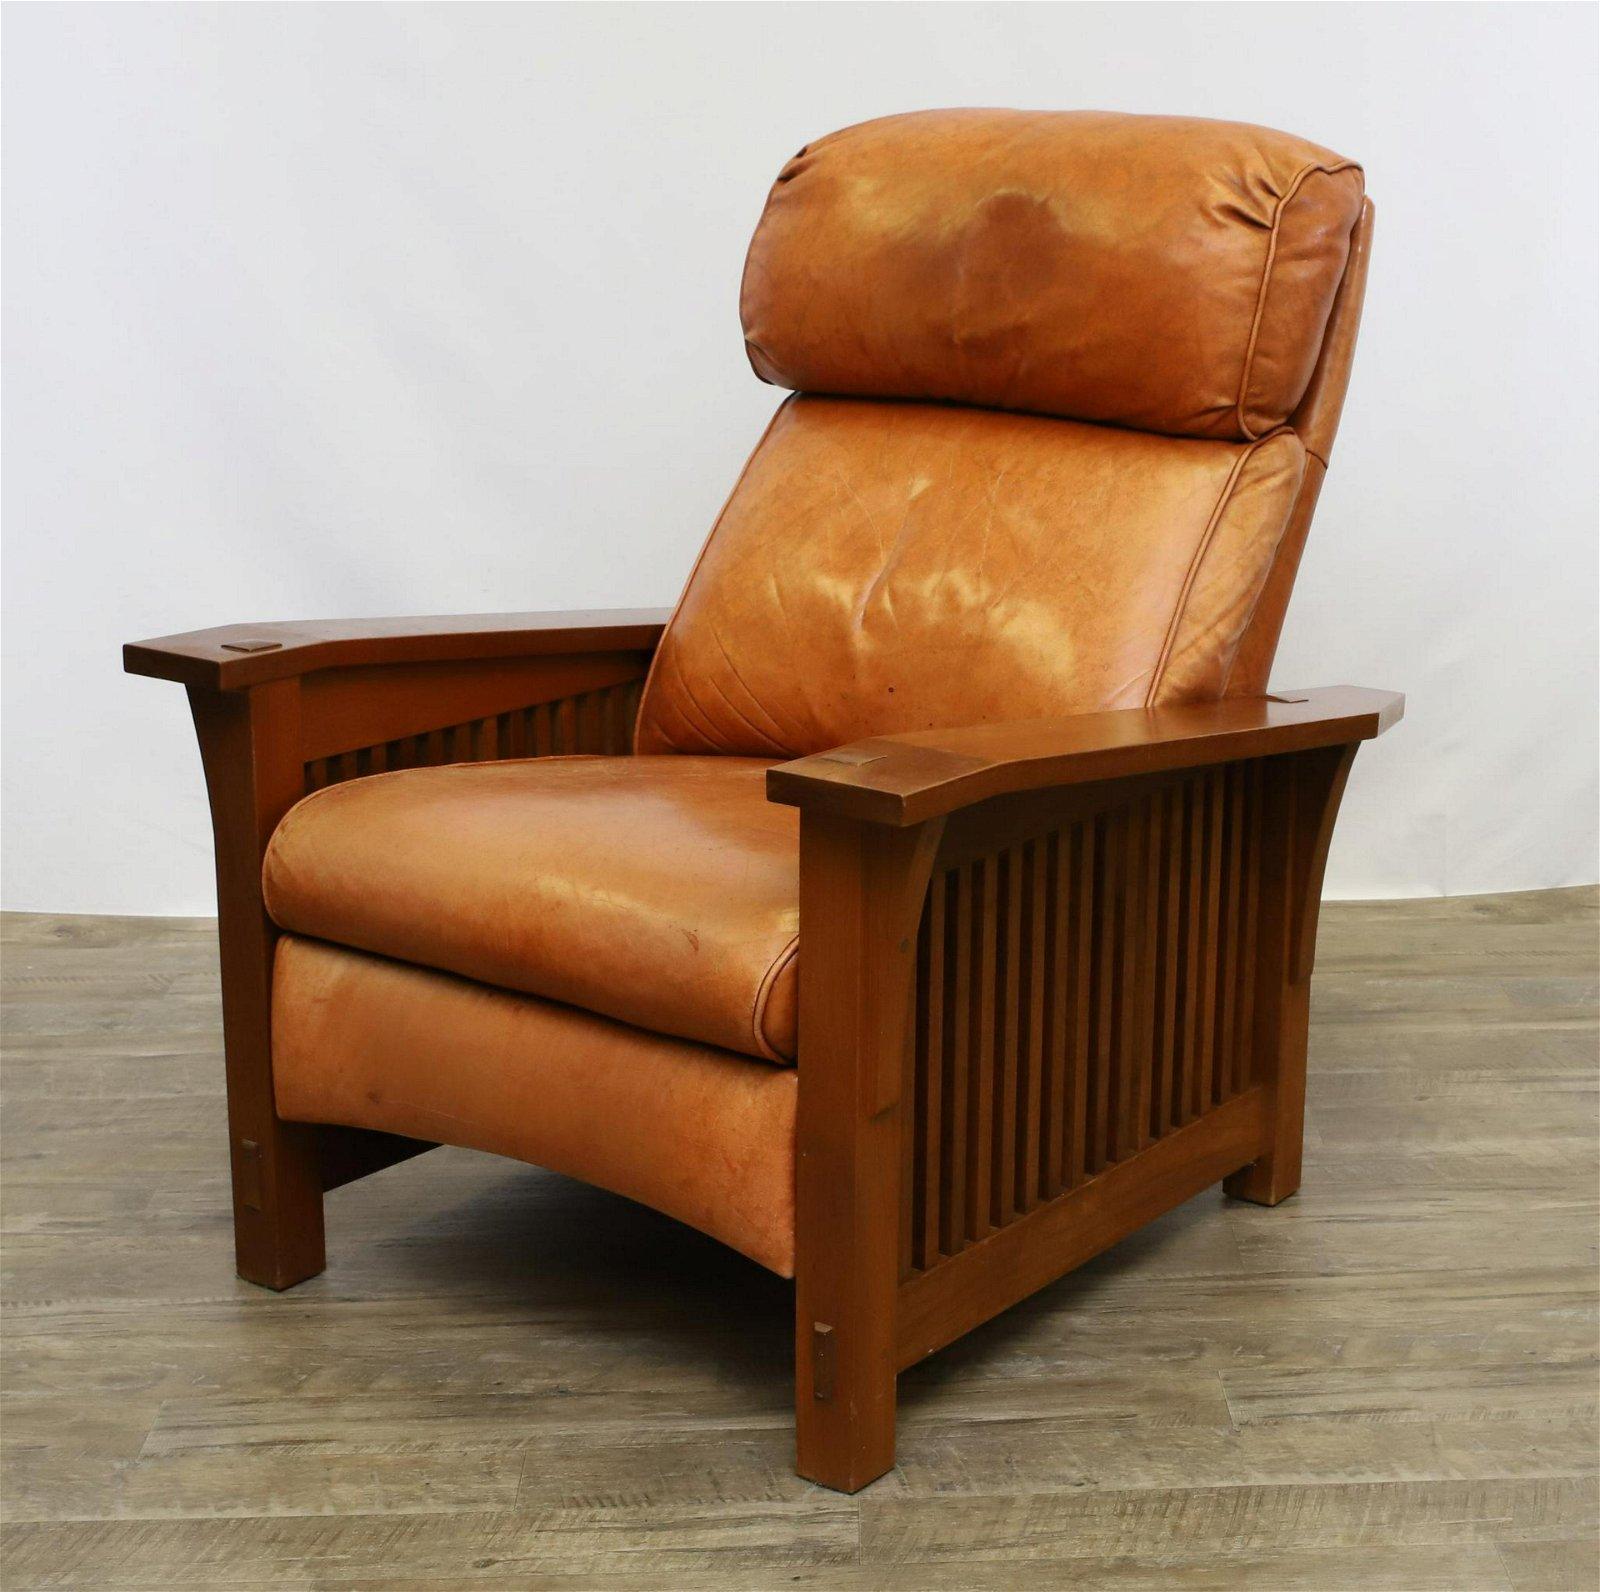 Brilliant Stickley Spindle Morris Recliner Machost Co Dining Chair Design Ideas Machostcouk